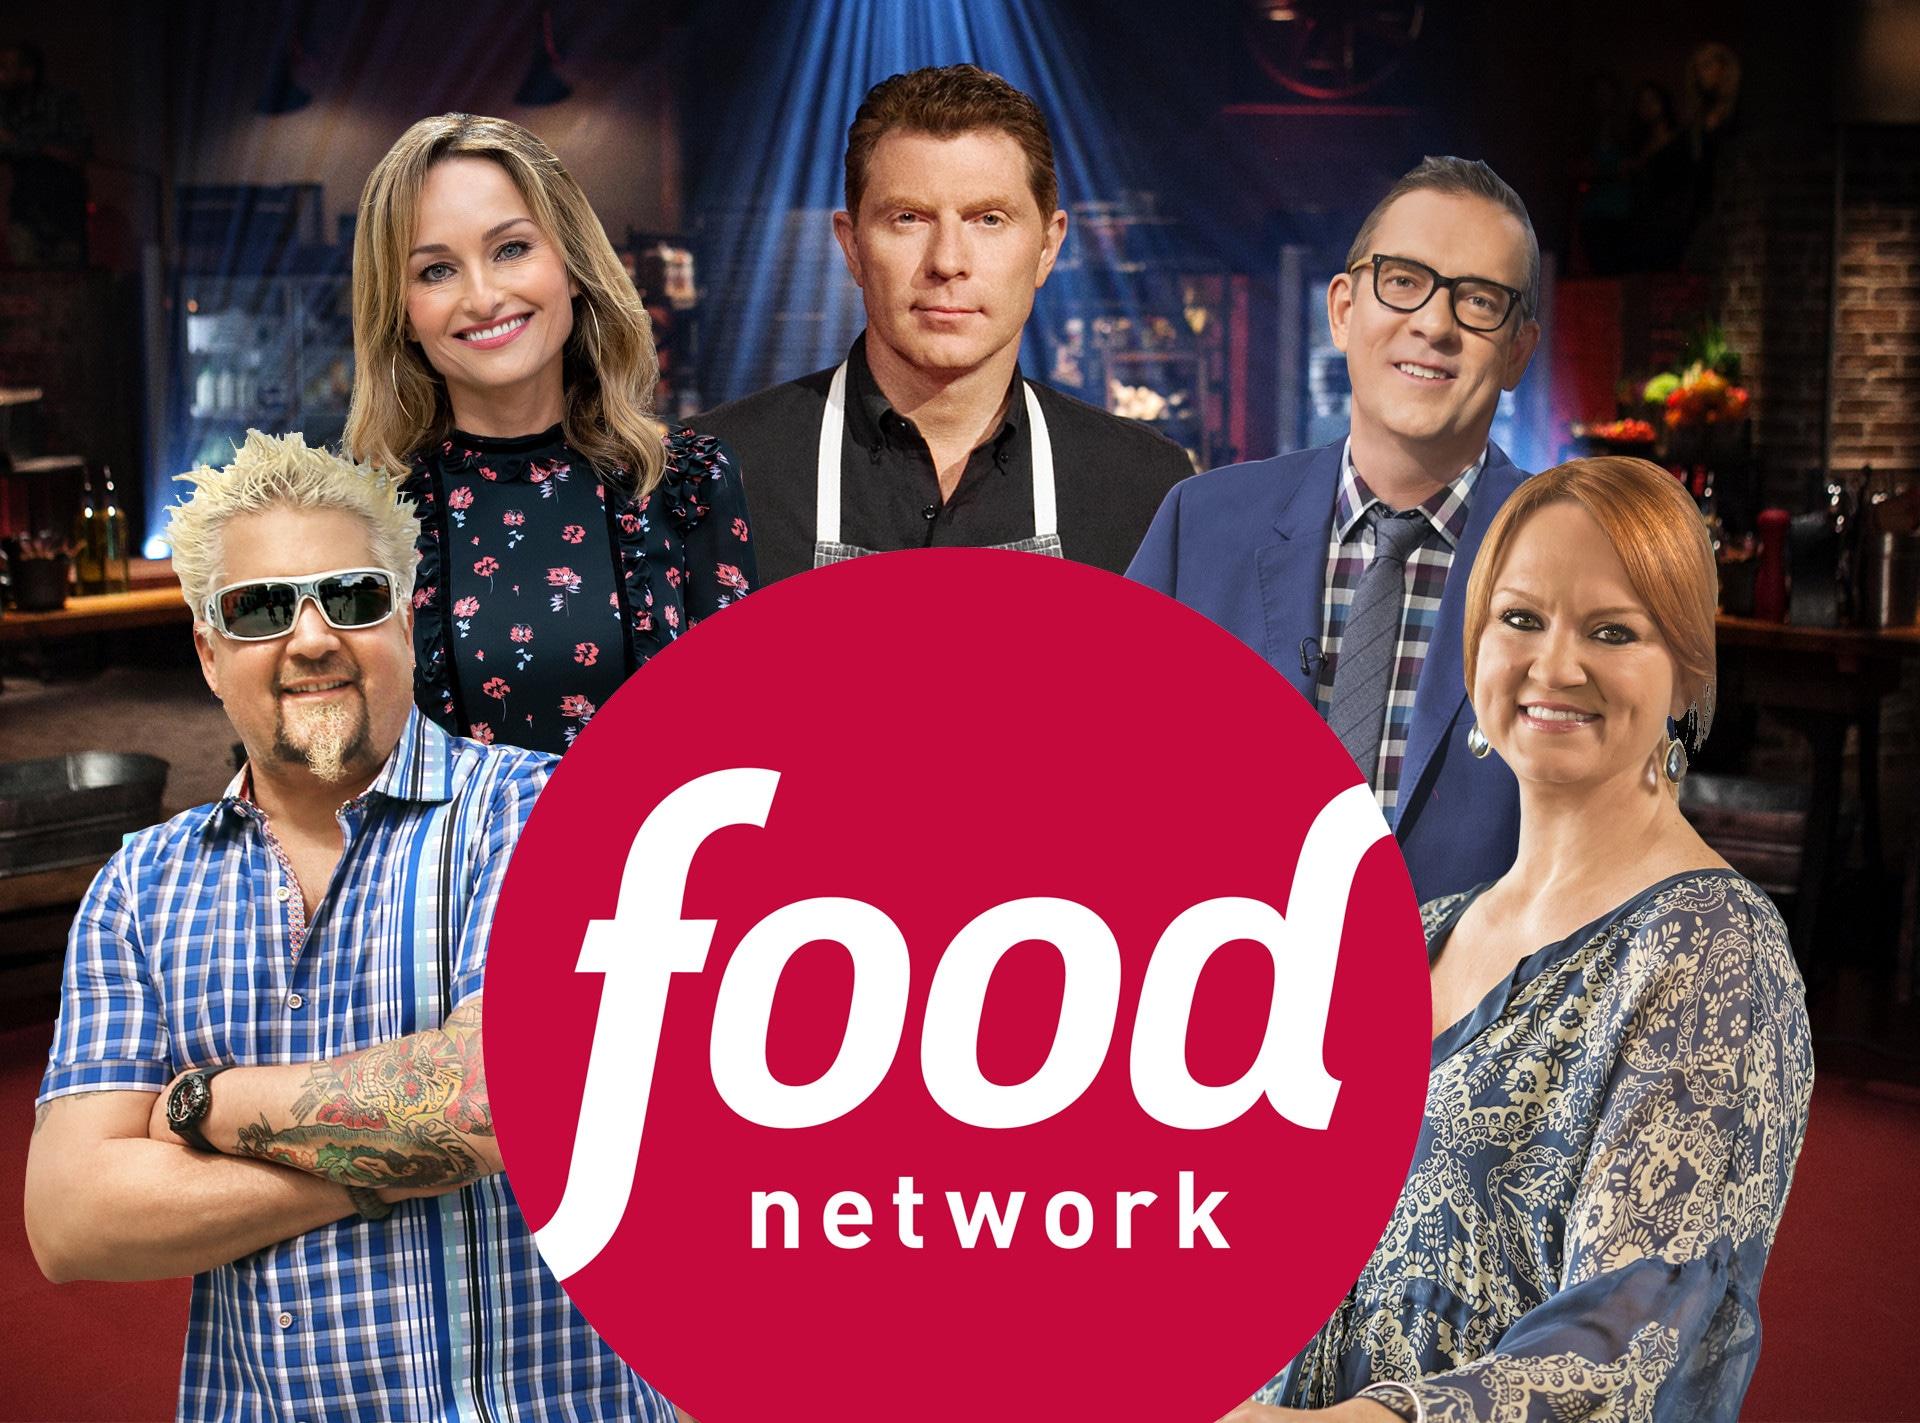 Secrets of the Food Network, Bobby Flay, Giada De Laurentiis, Ted Allen, Guy Fieri, and Ree Drummond